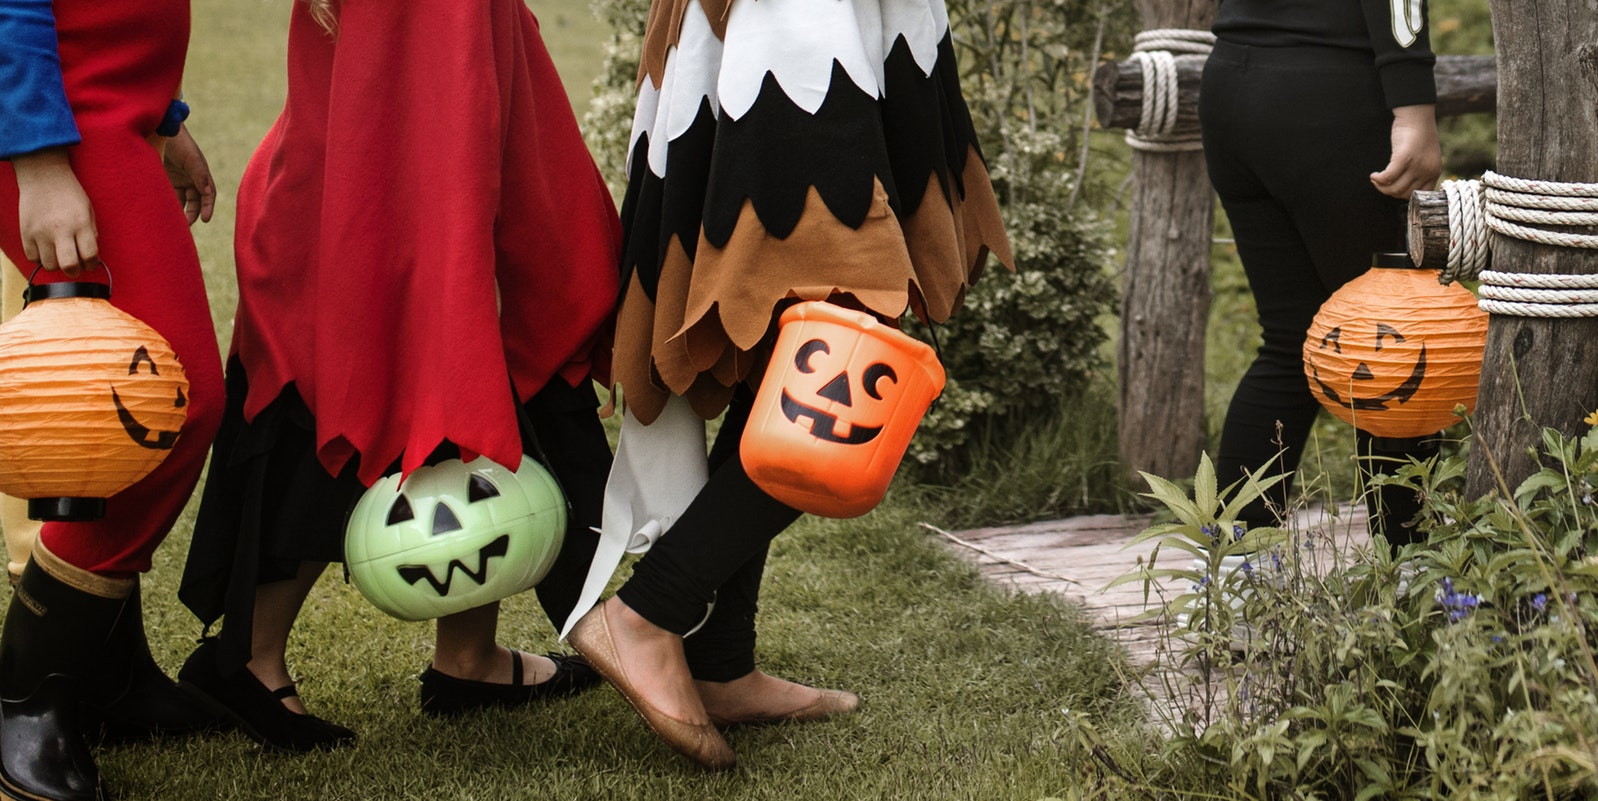 Americans spend US$9 billion on Halloween